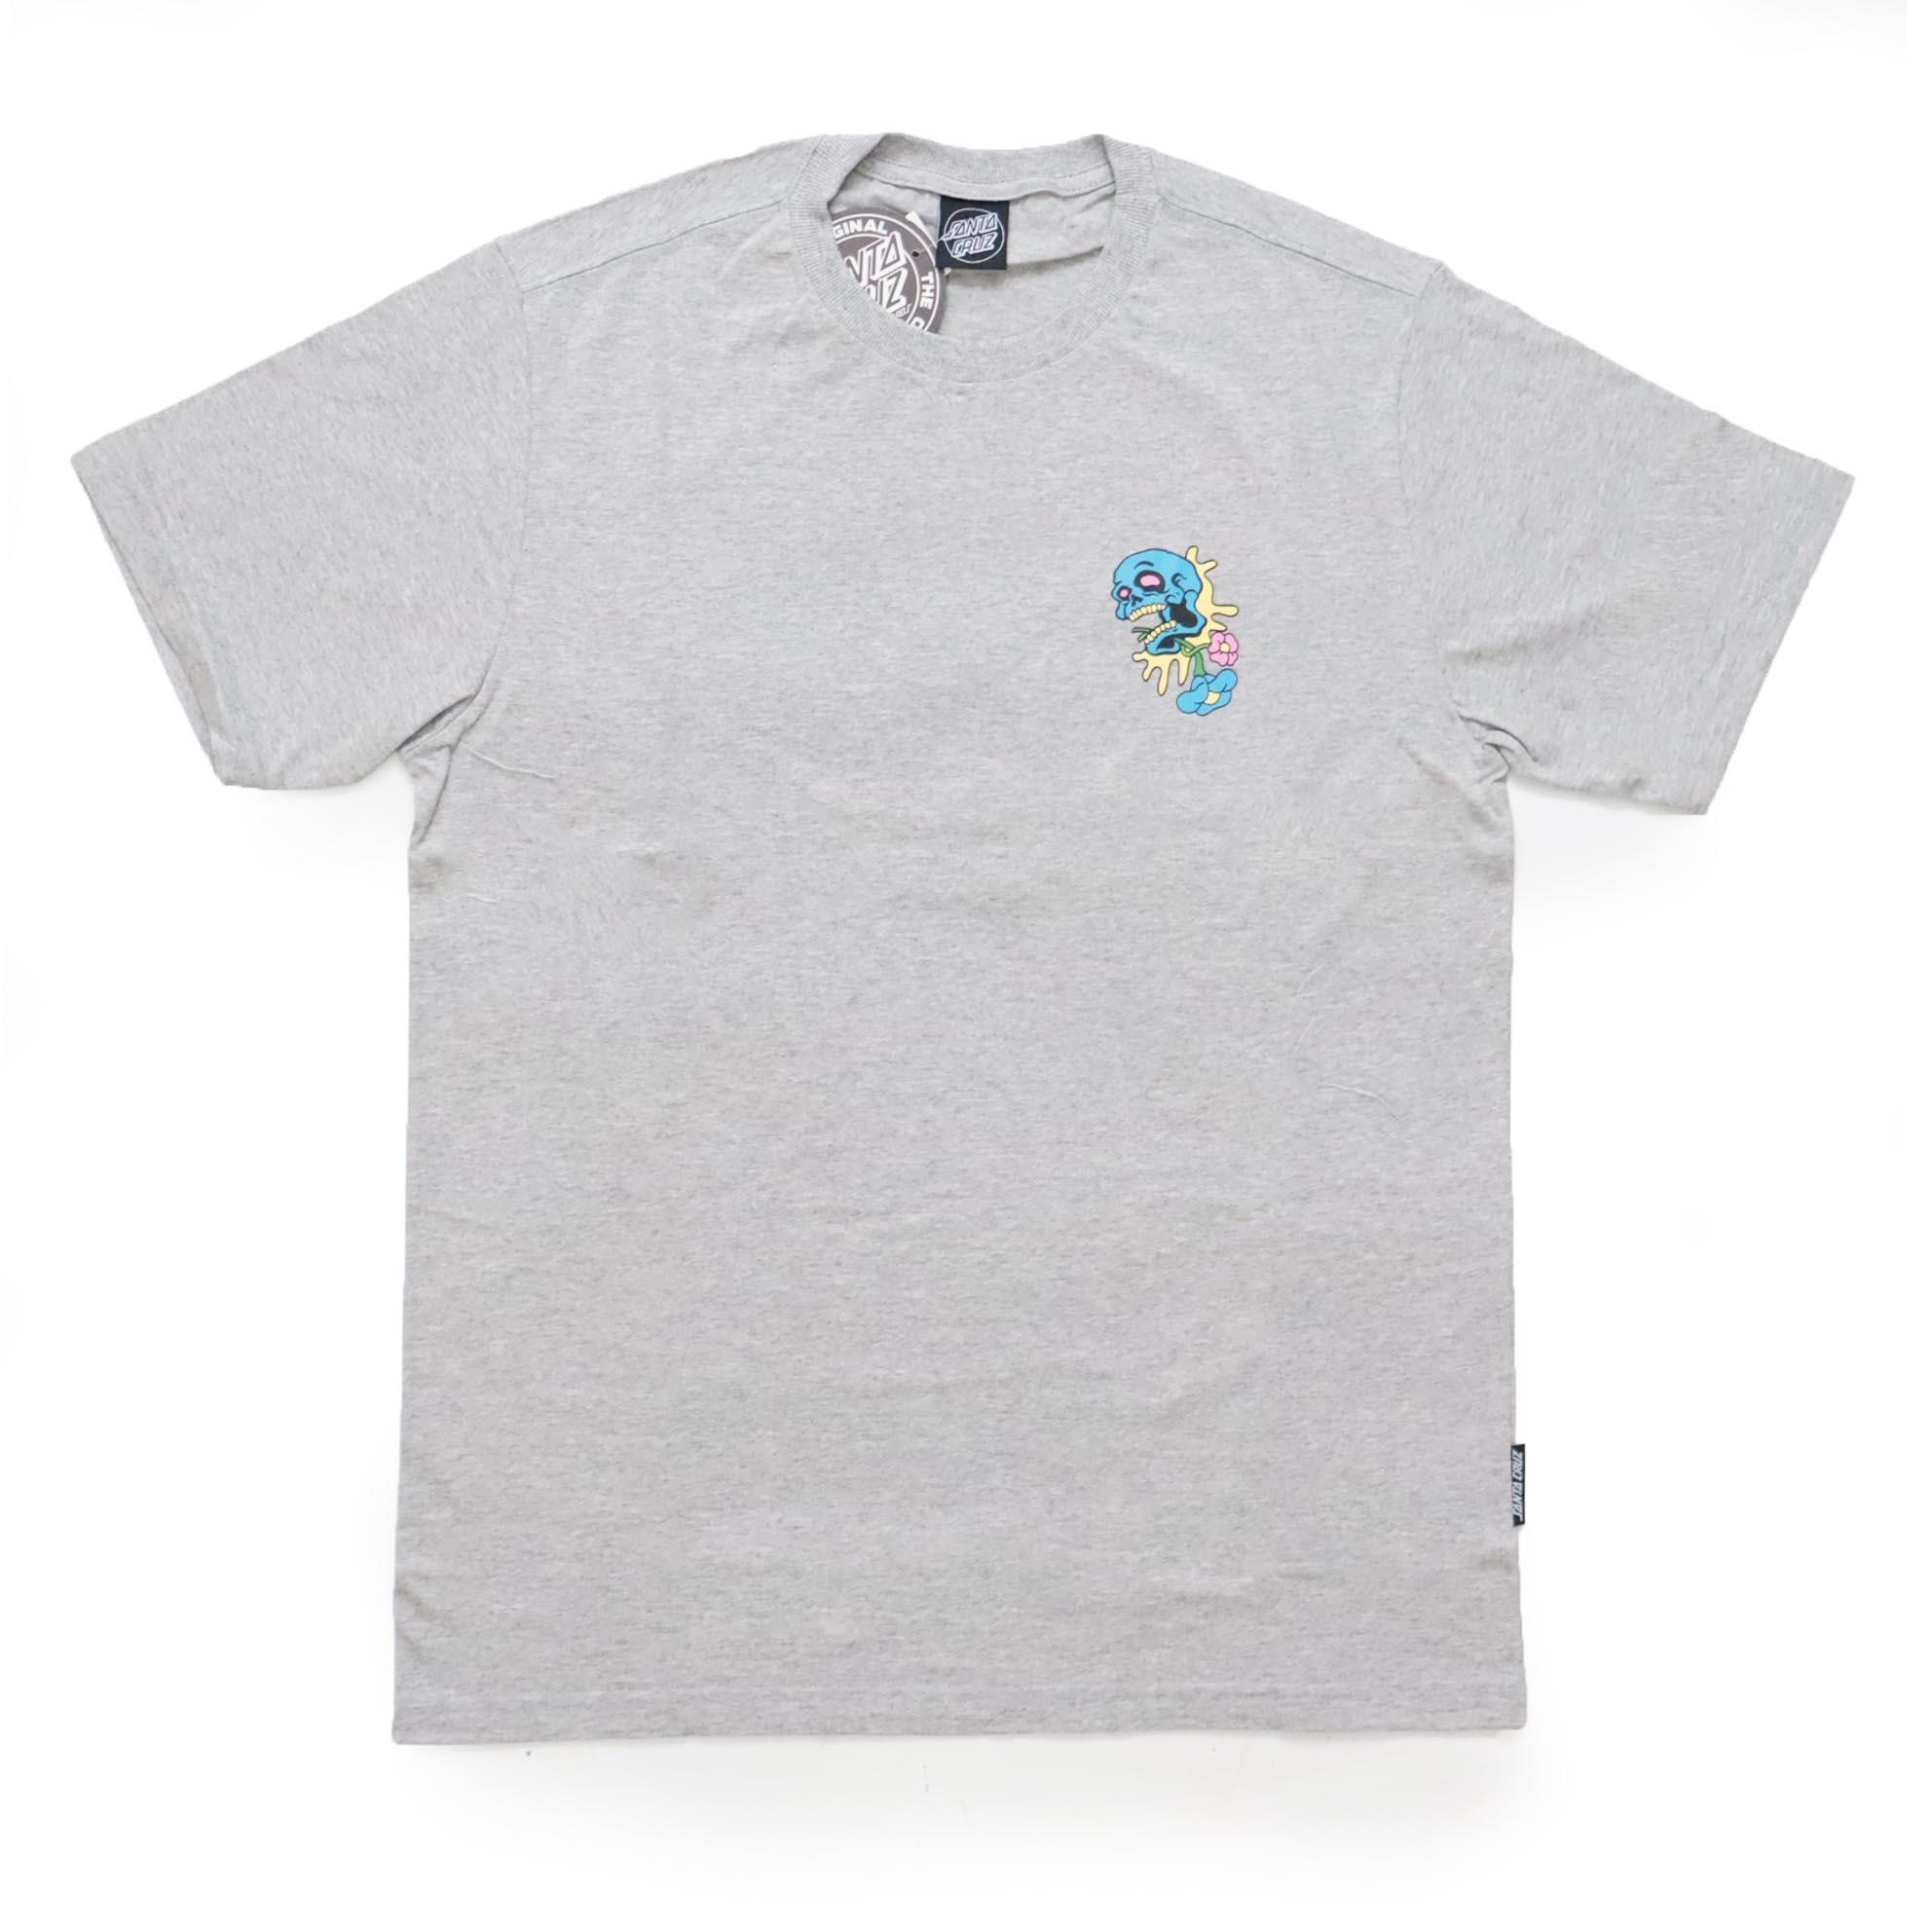 Camiseta Santa Cruz Baked Dot - Cinza Mescla